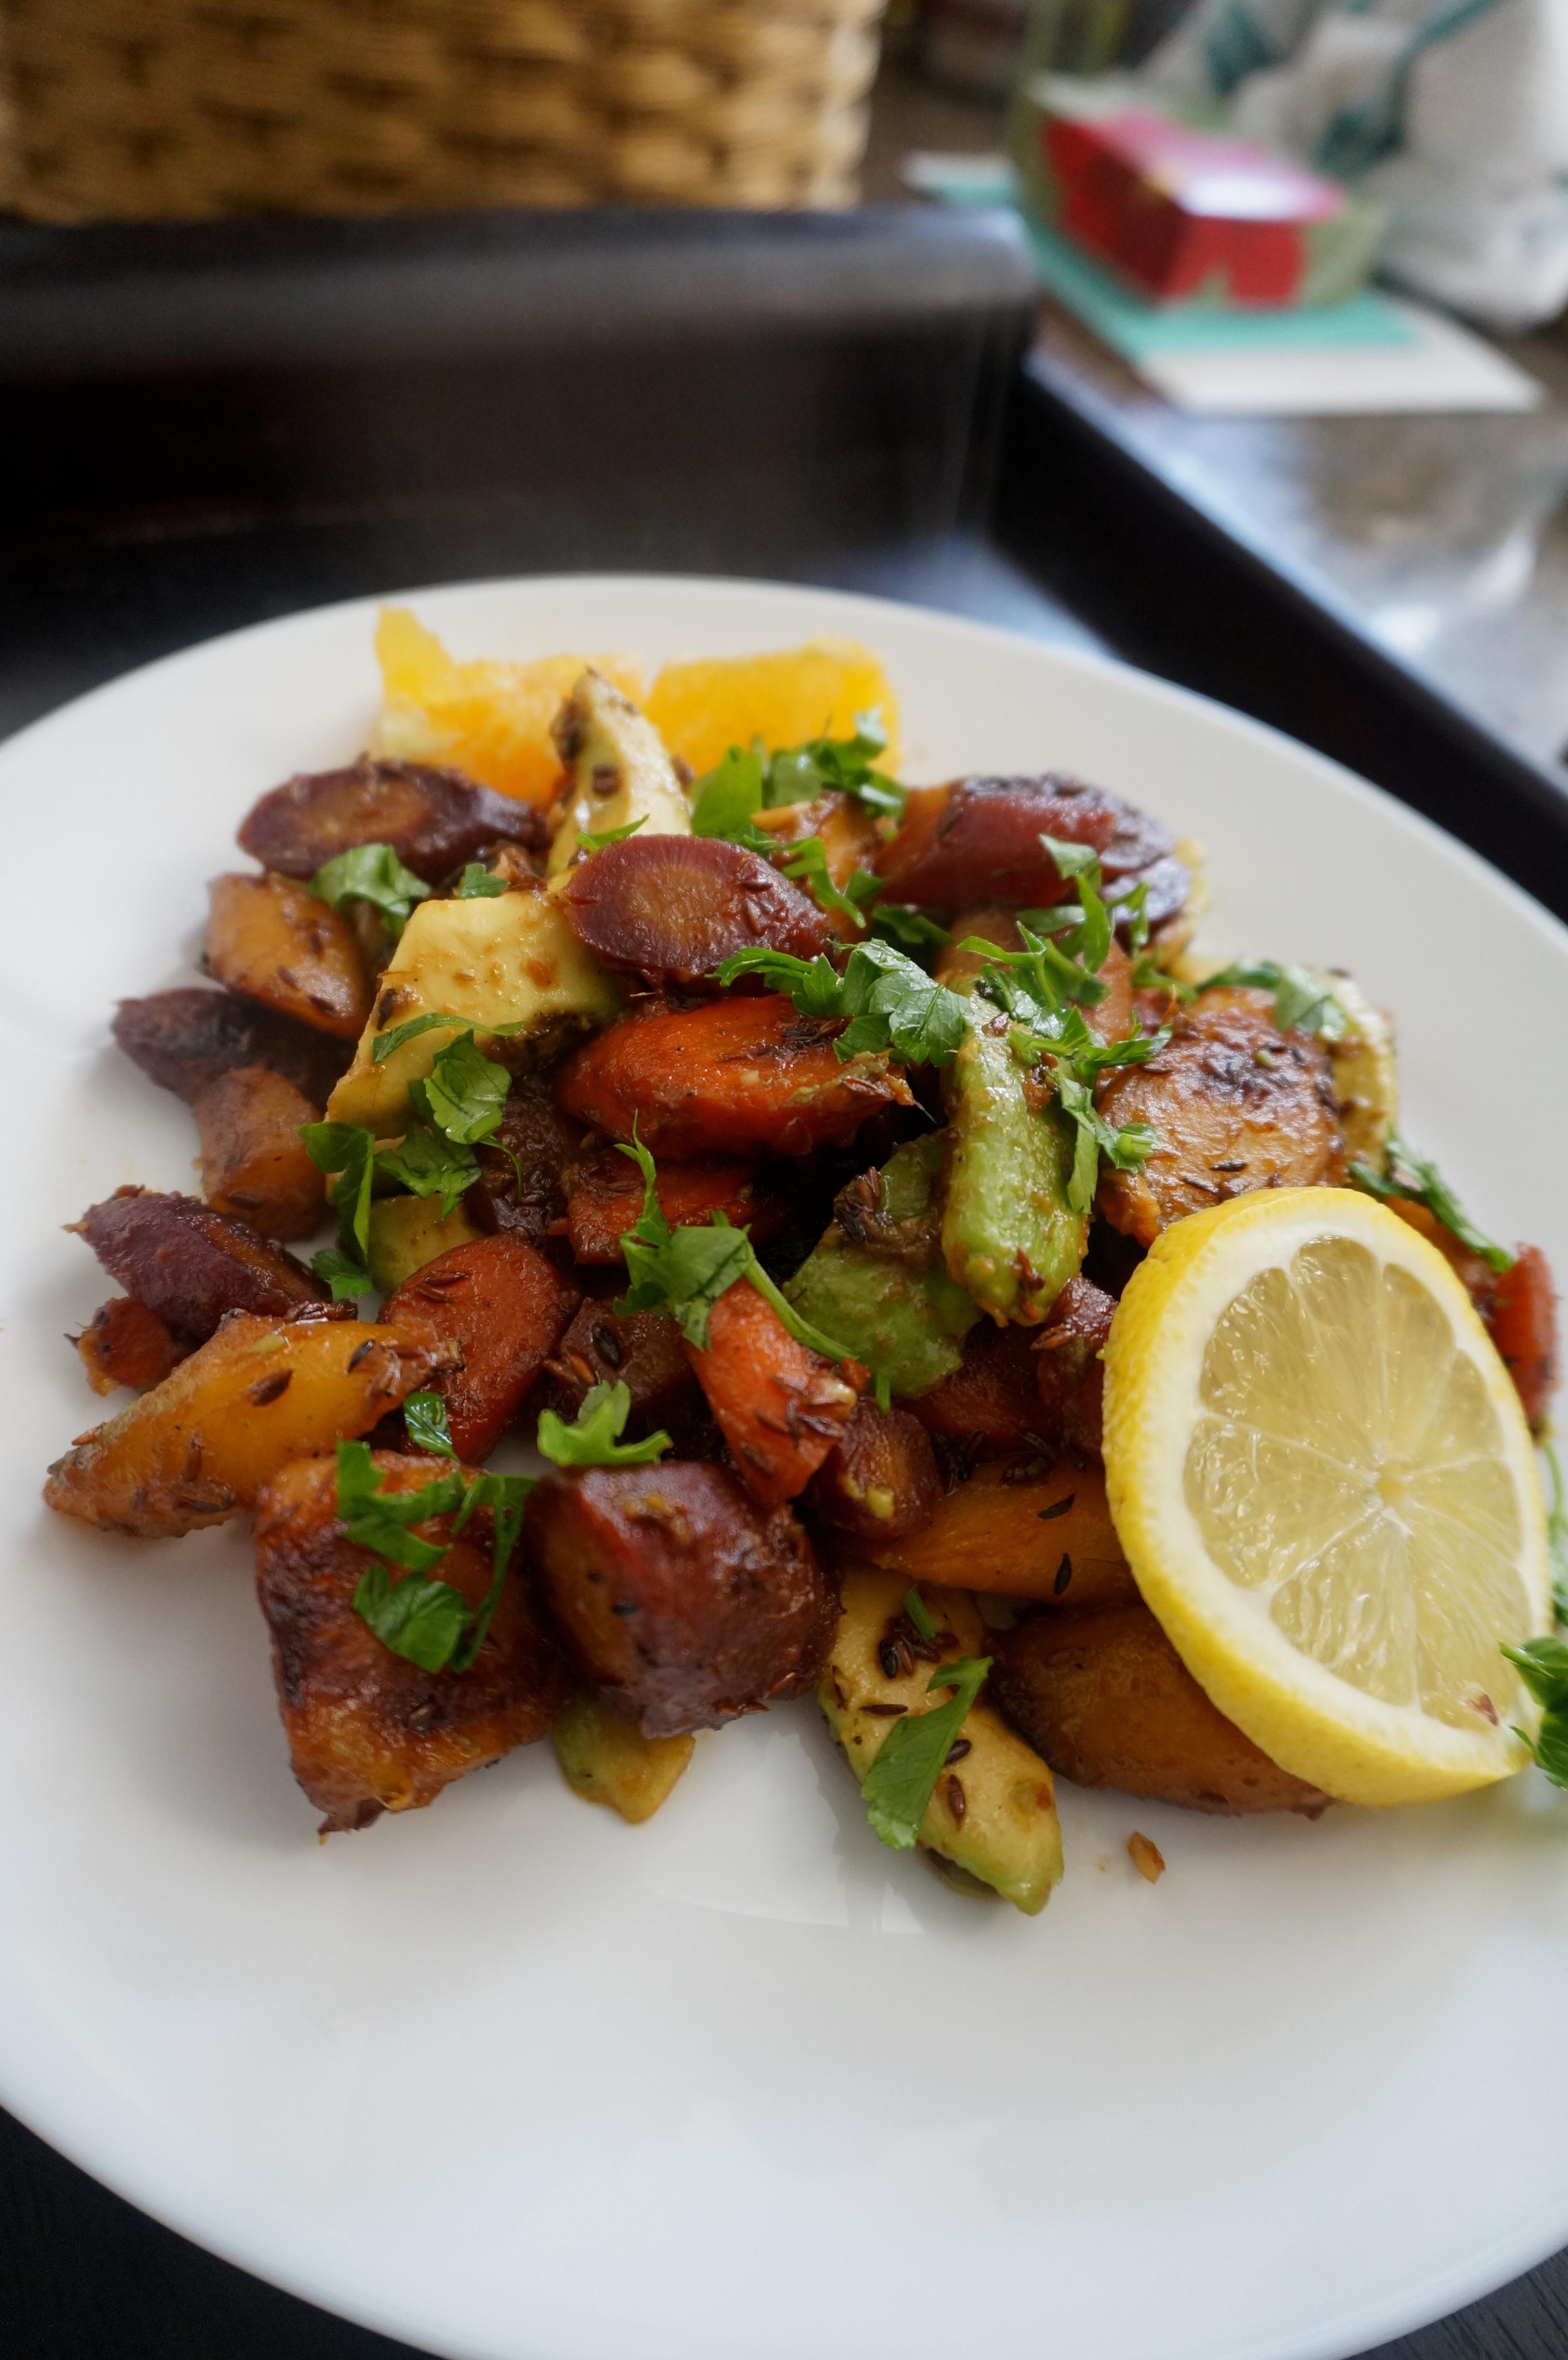 Pan Roasted Carrot and Avocado Salad